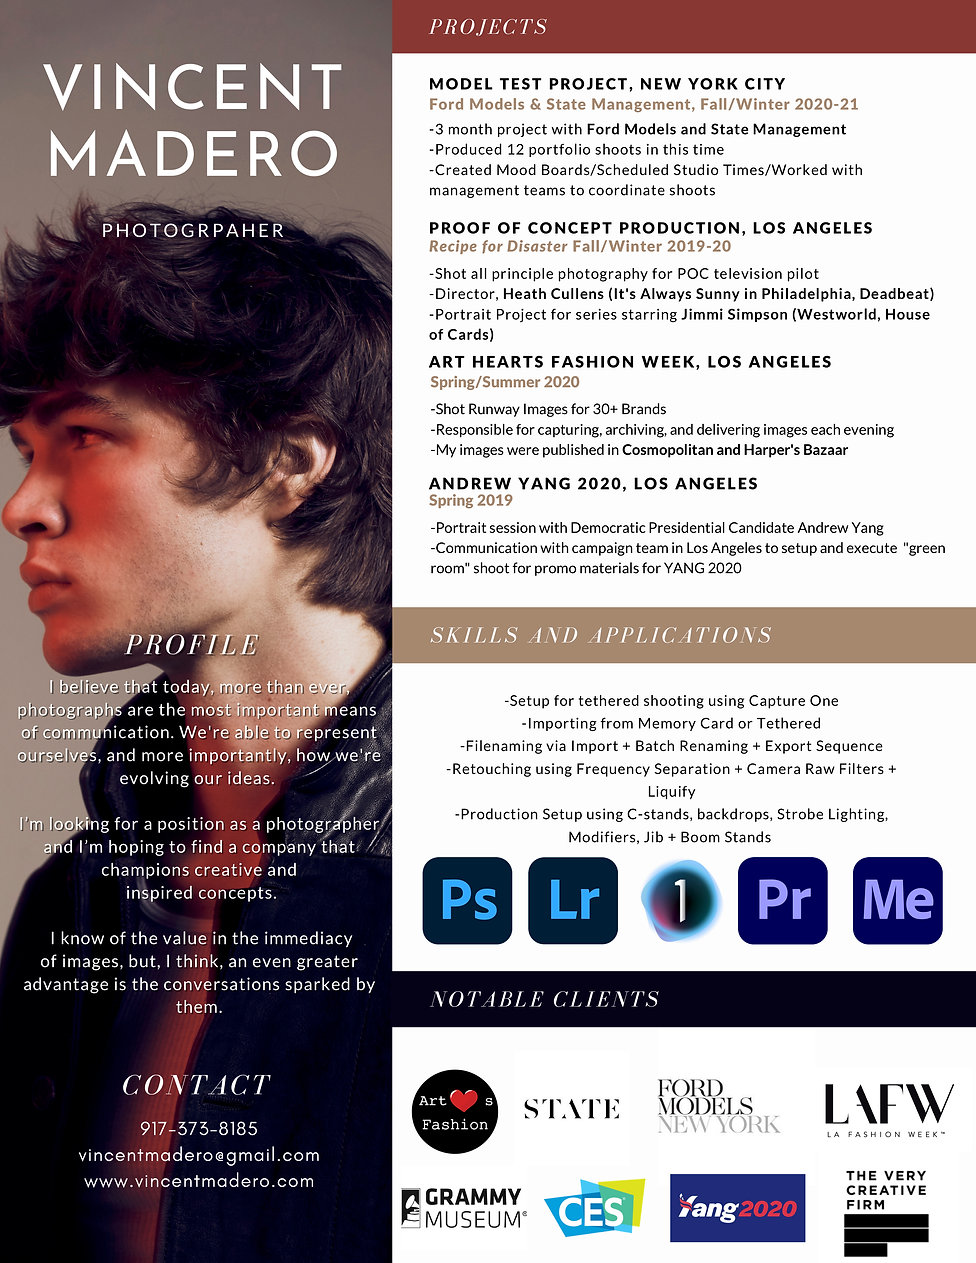 V. Madero Photo Resume 2021 ii.jpg